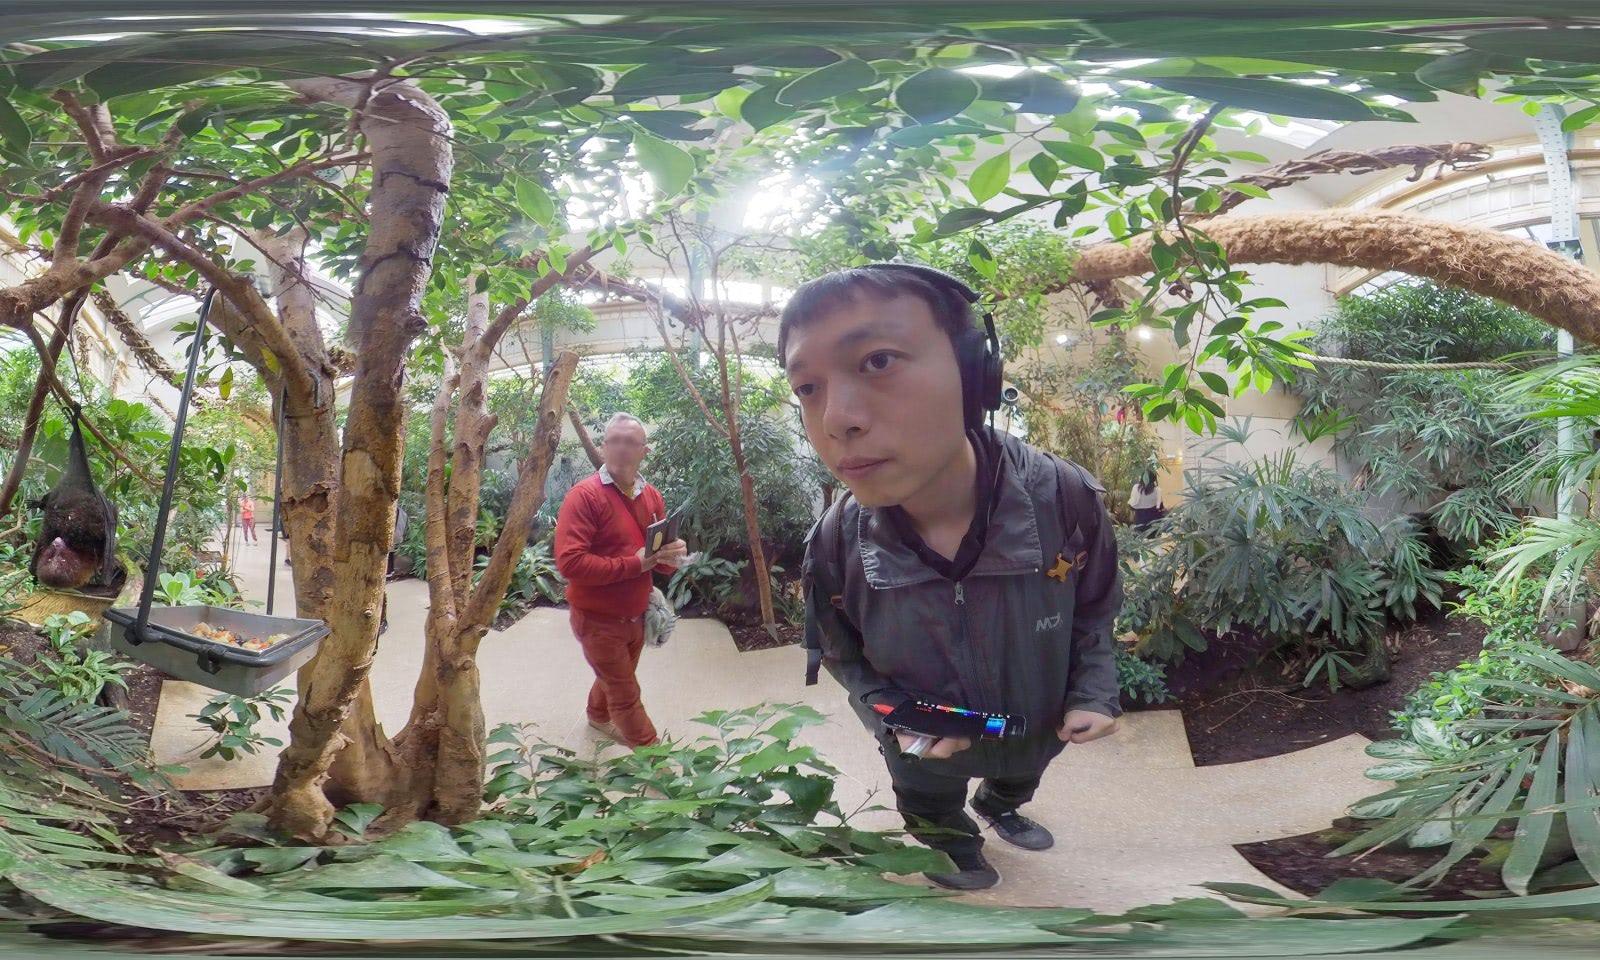 Visual of Next Generation: Sheng-Wen Lo hears ultrasound waves like pets do